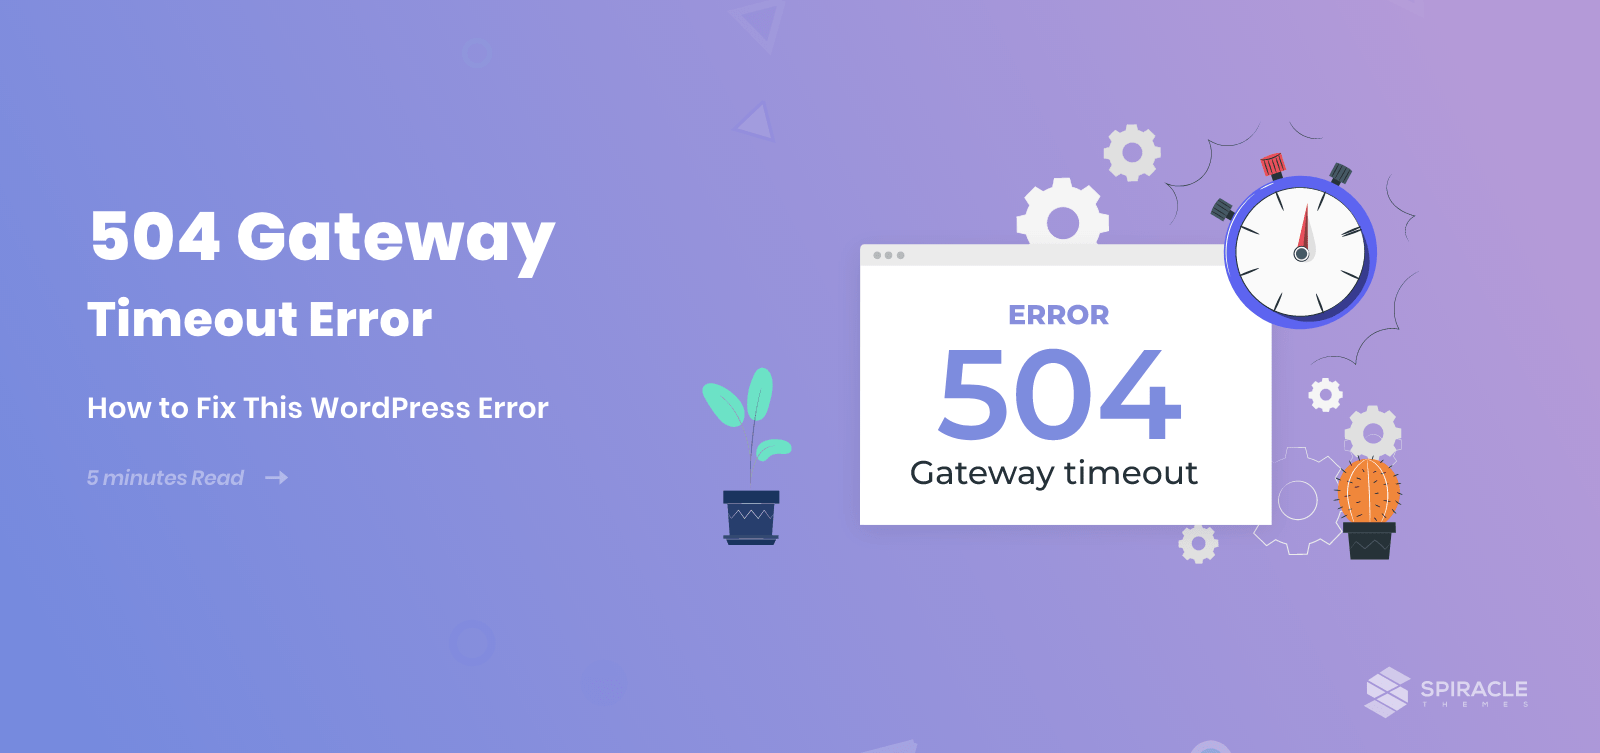 504 gateway timeout error in WordPress